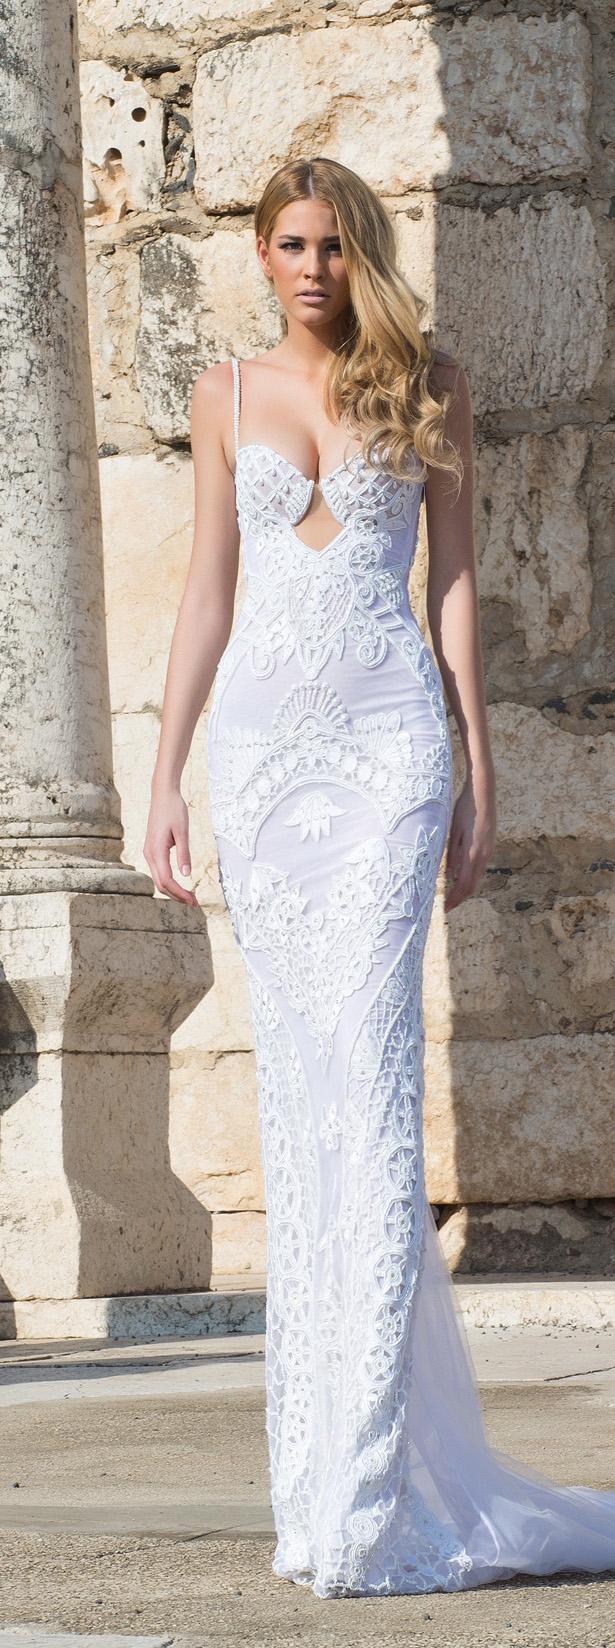 shabiisrael-2015-wedding-dresses-56